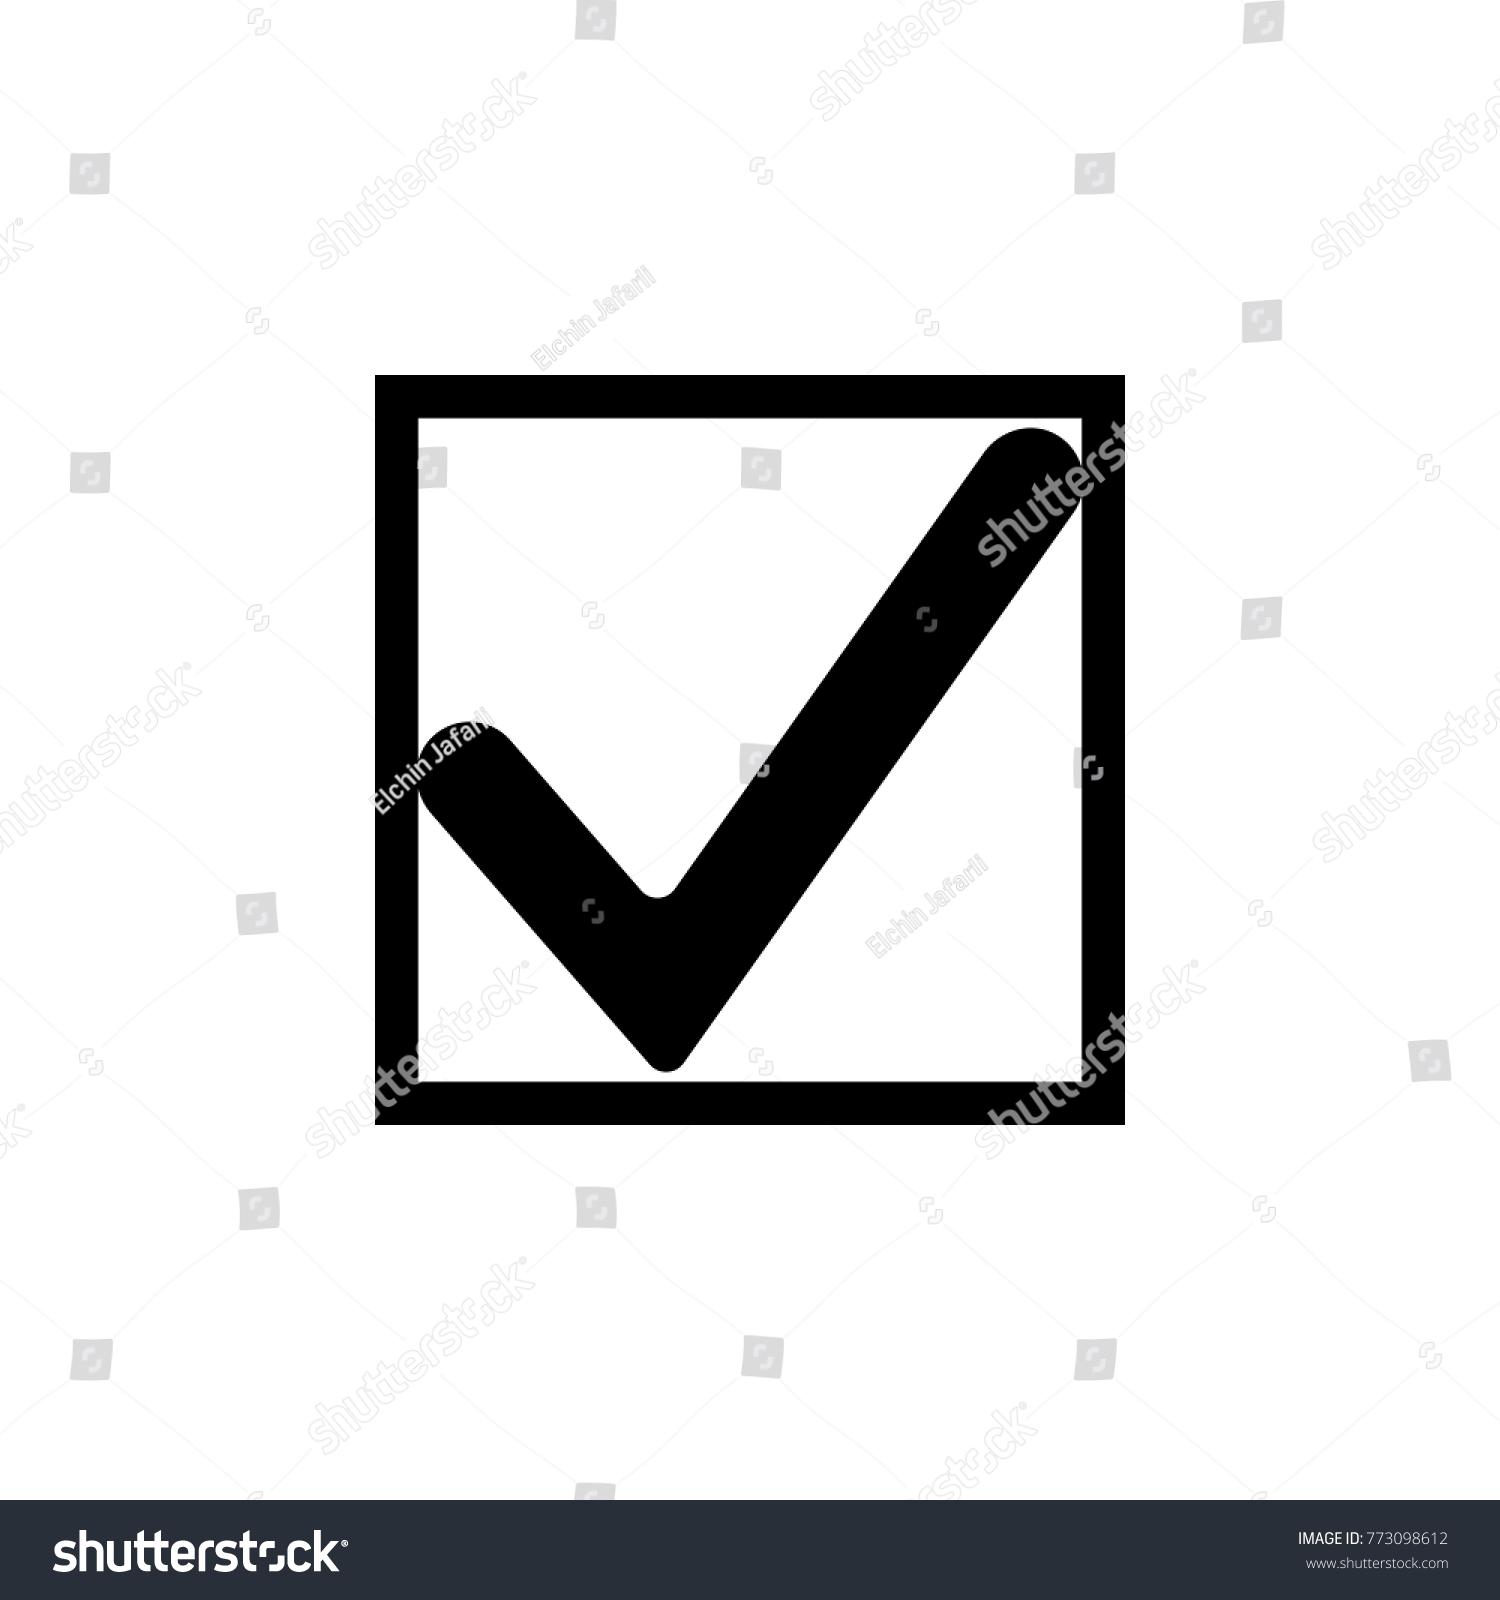 Checked sign icon strategy managment icon stock illustration checked sign icon strategy managment icon premium quality graphic design signs symbols buycottarizona Choice Image